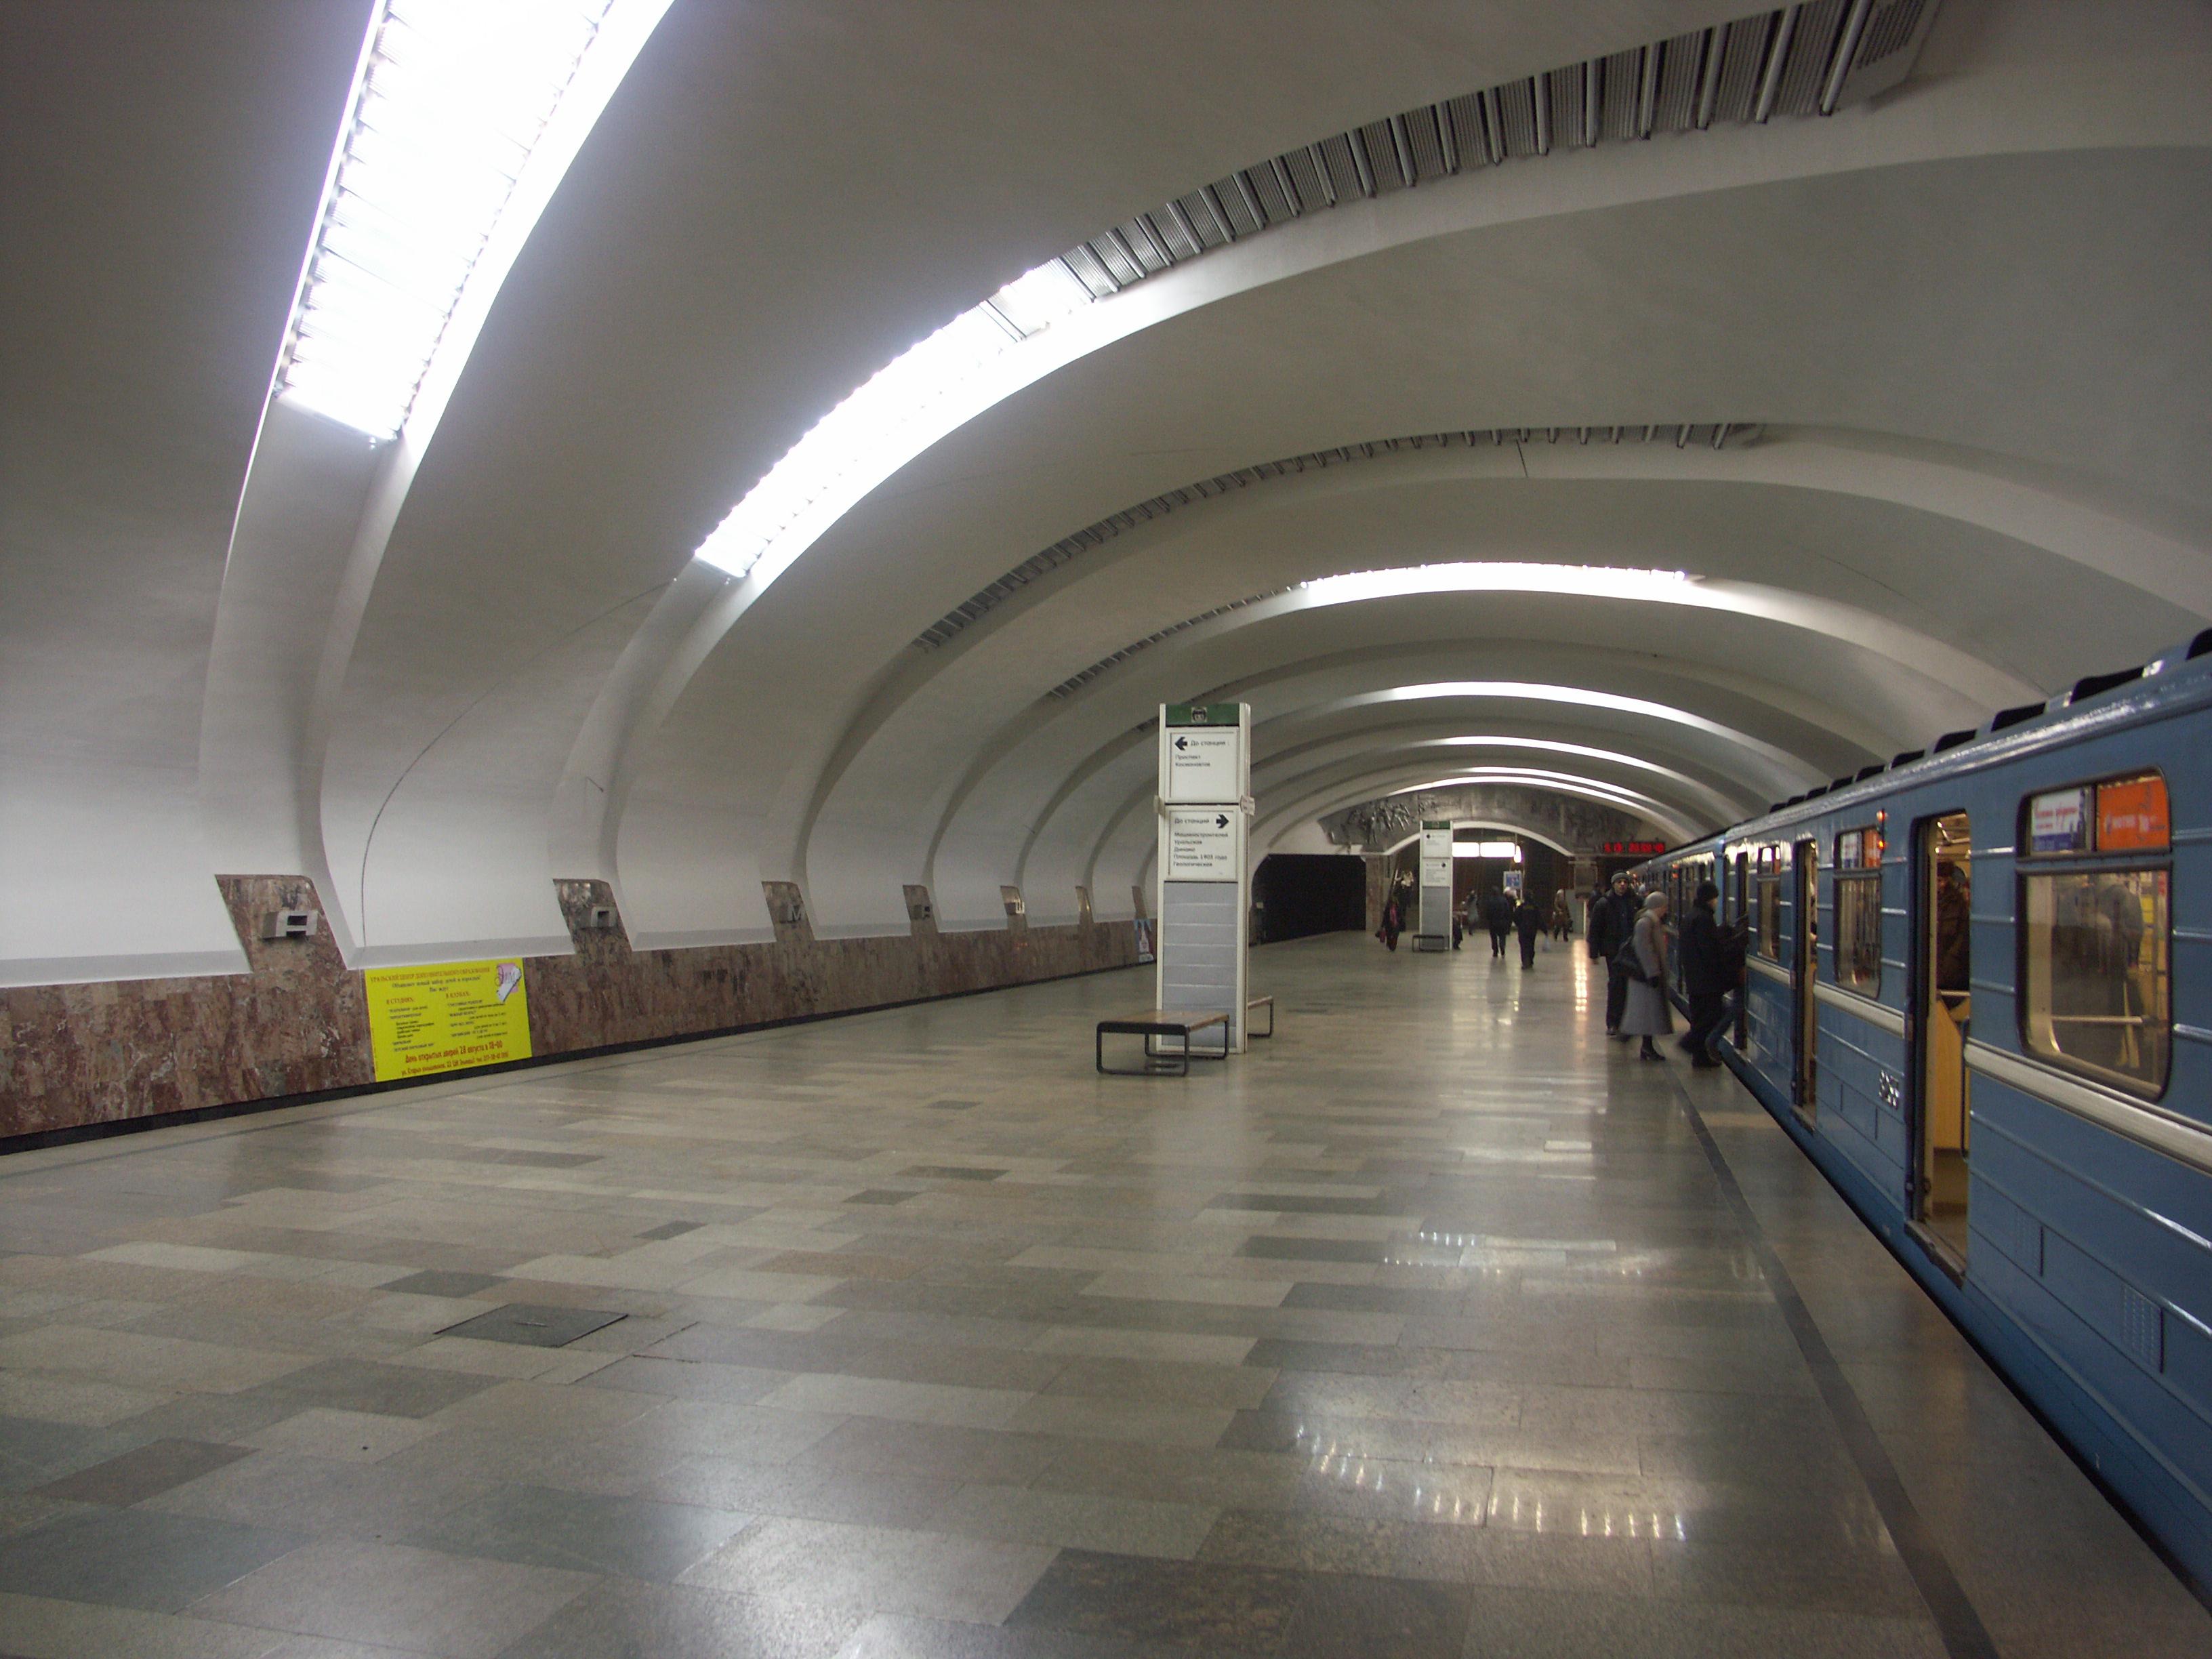 картинка метро урала как сложилась